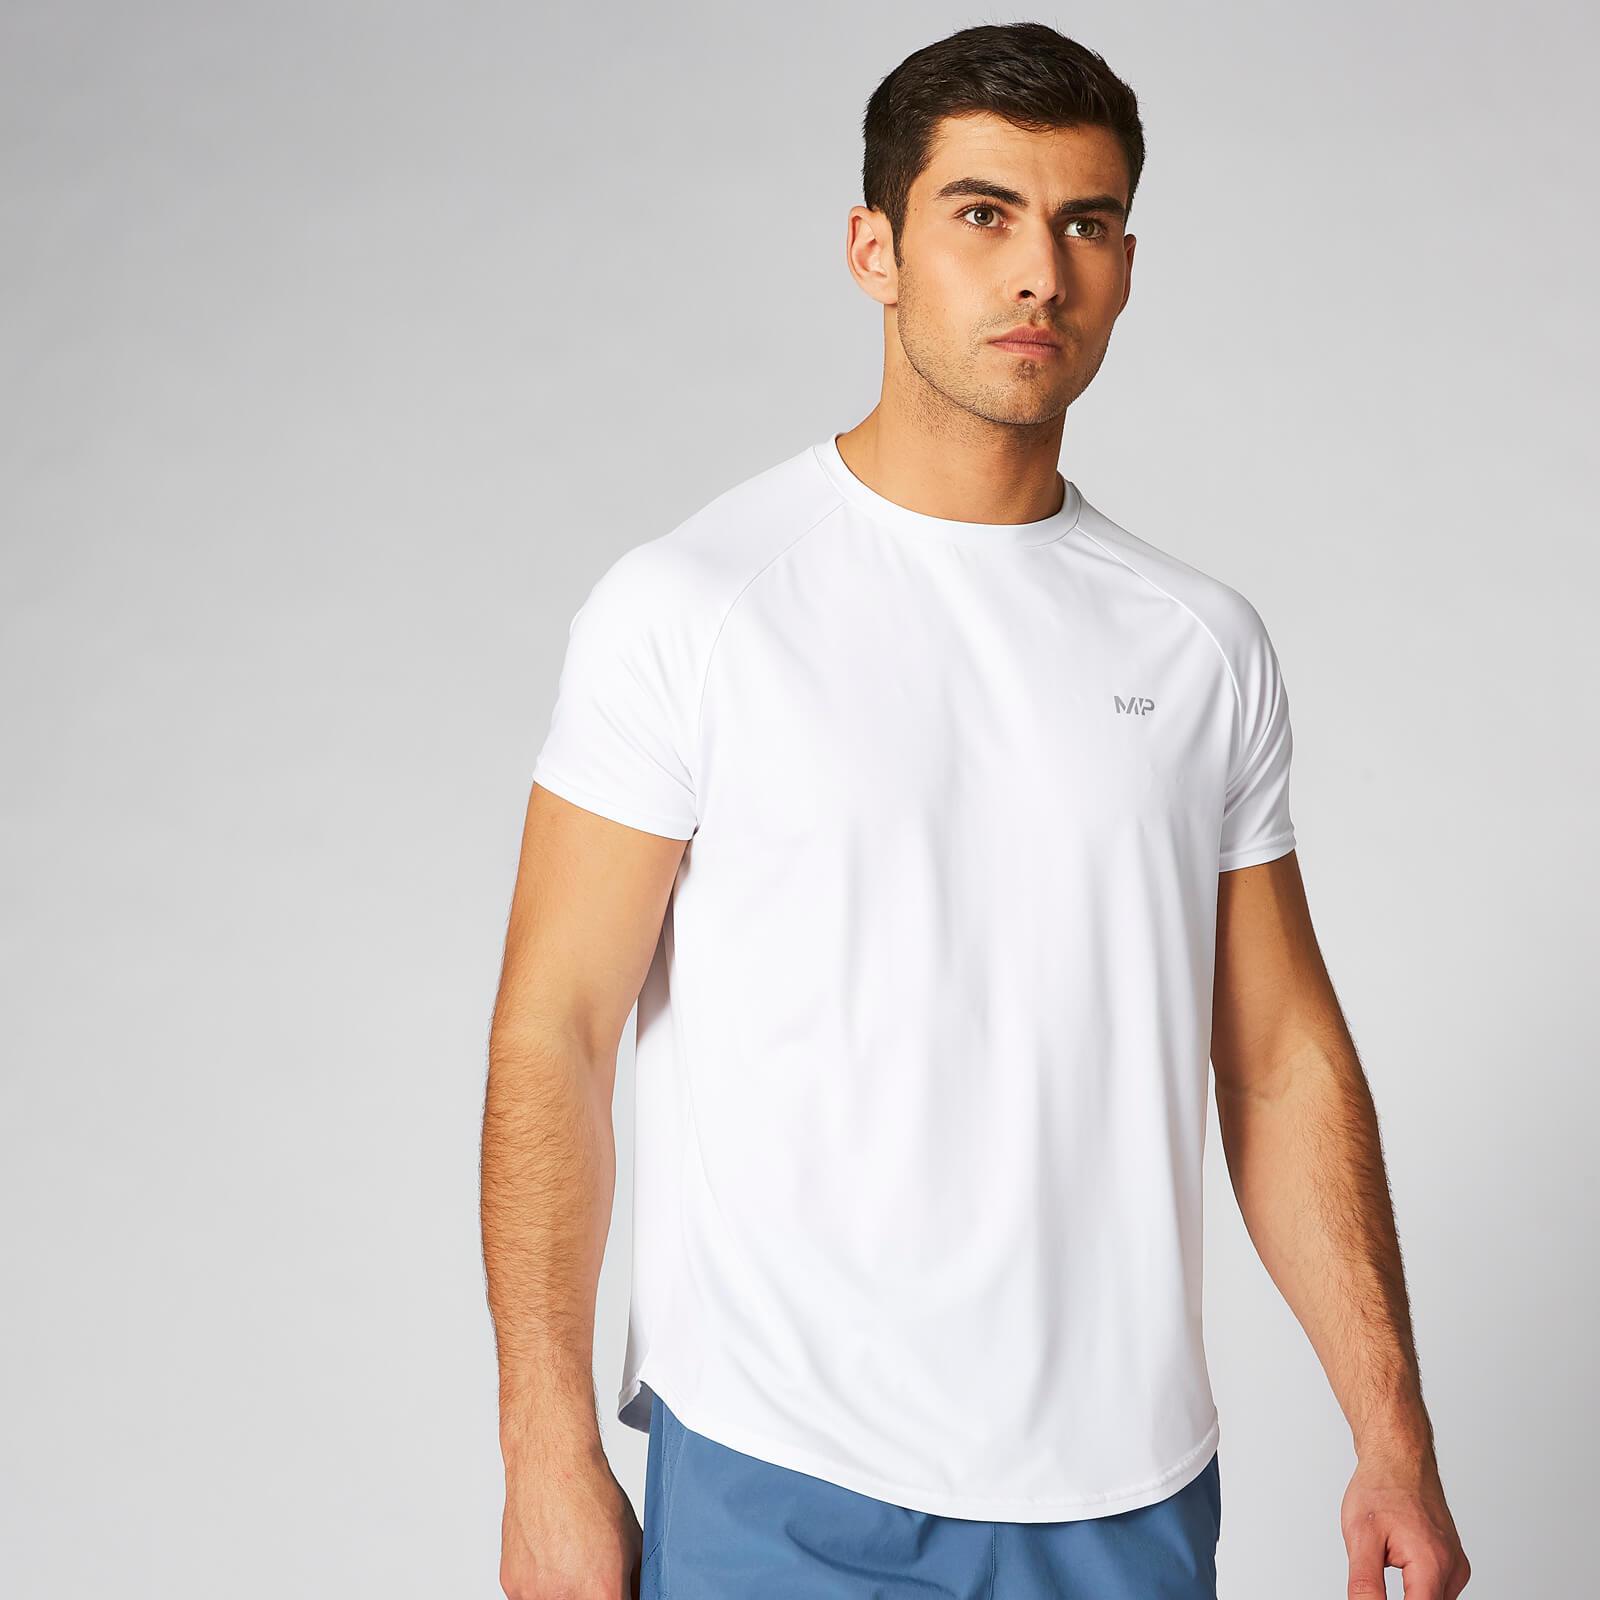 Myprotein Dry-Tech Infinity T-Shirt - White - M